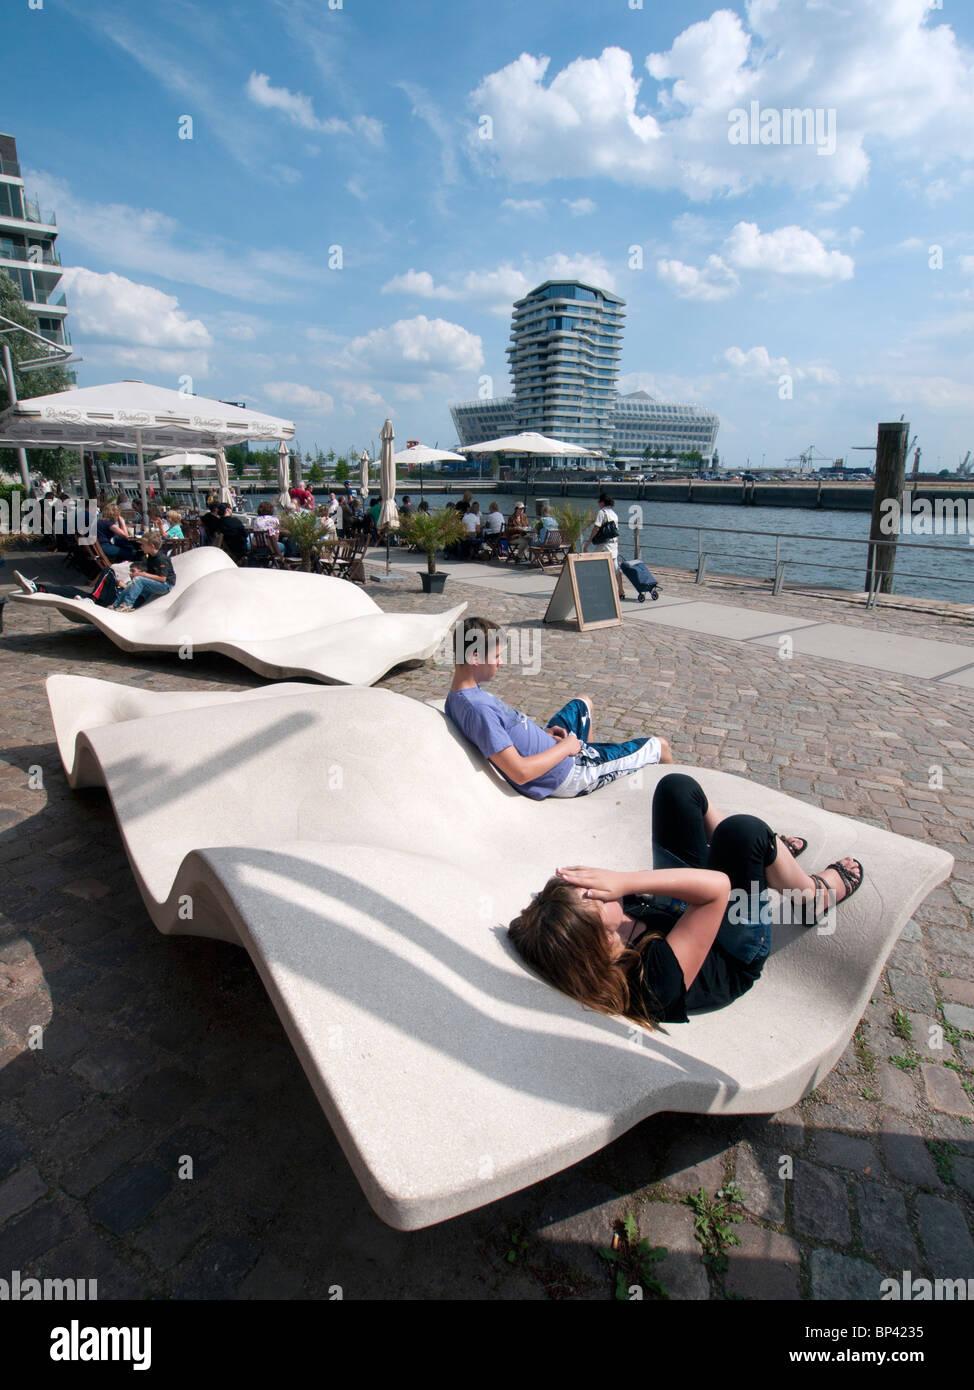 Modern promenade at Vasco Da Gamma Platz in new Hafencity property development in Hamburg Germany - Stock Image